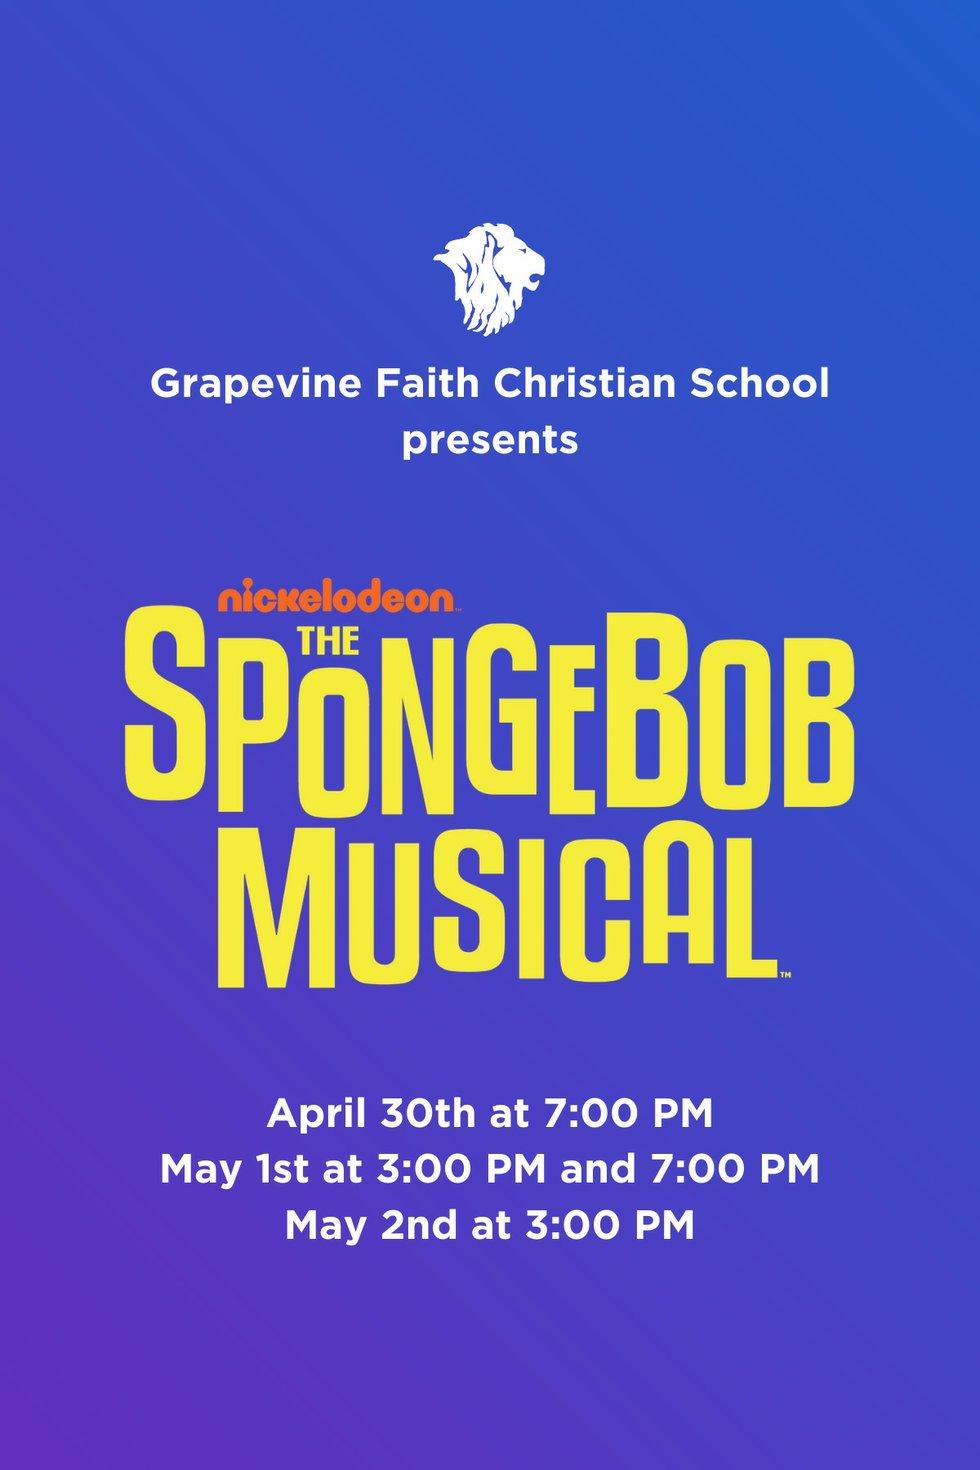 Grapevine Faith High School in Southlake, Tx Presents 'The SpongeBob Musical'